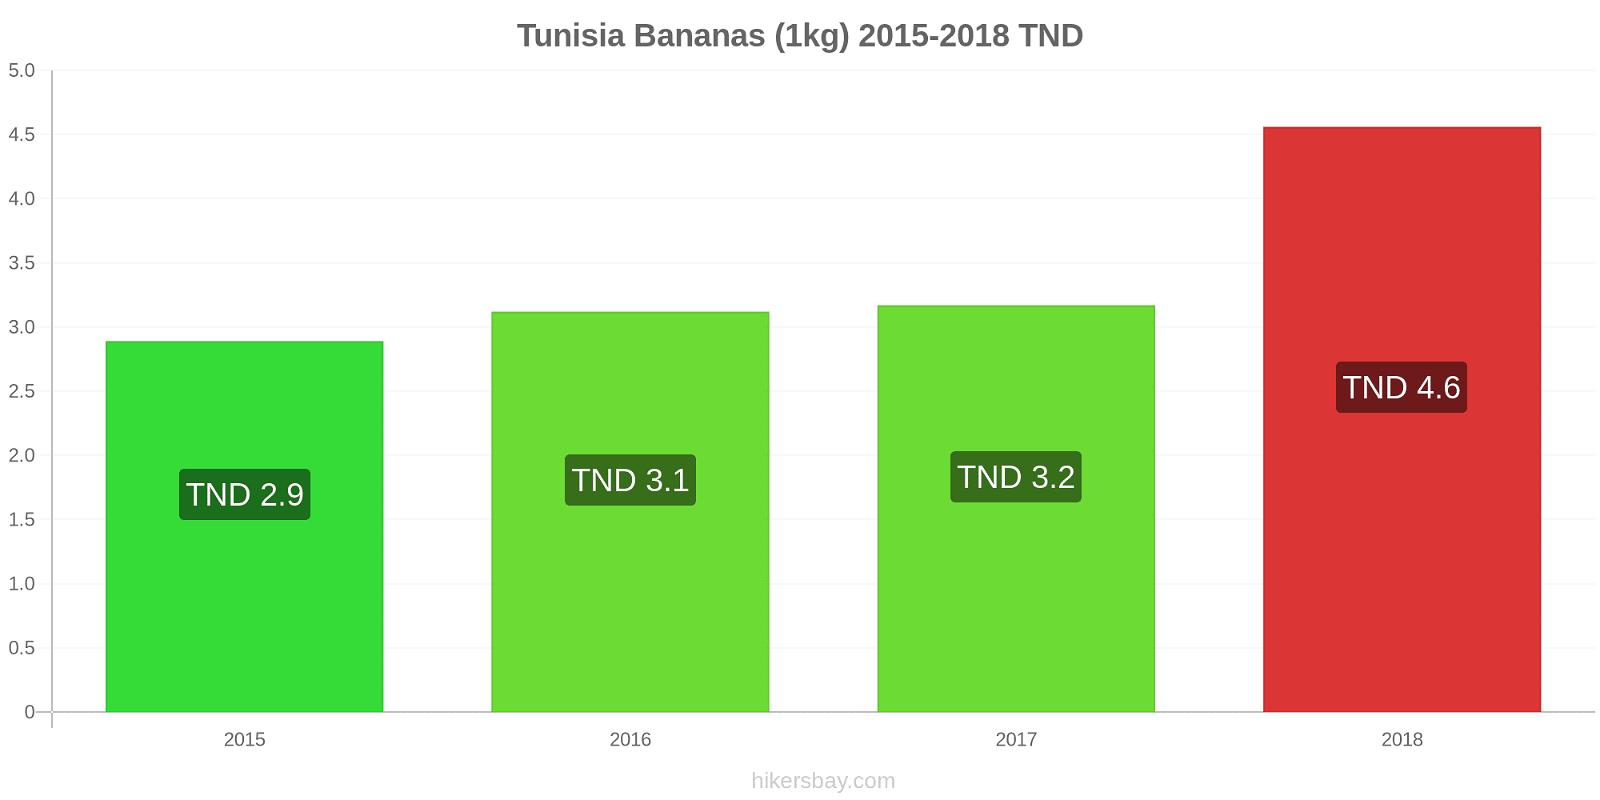 Tunisia price changes Bananas (1kg) hikersbay.com